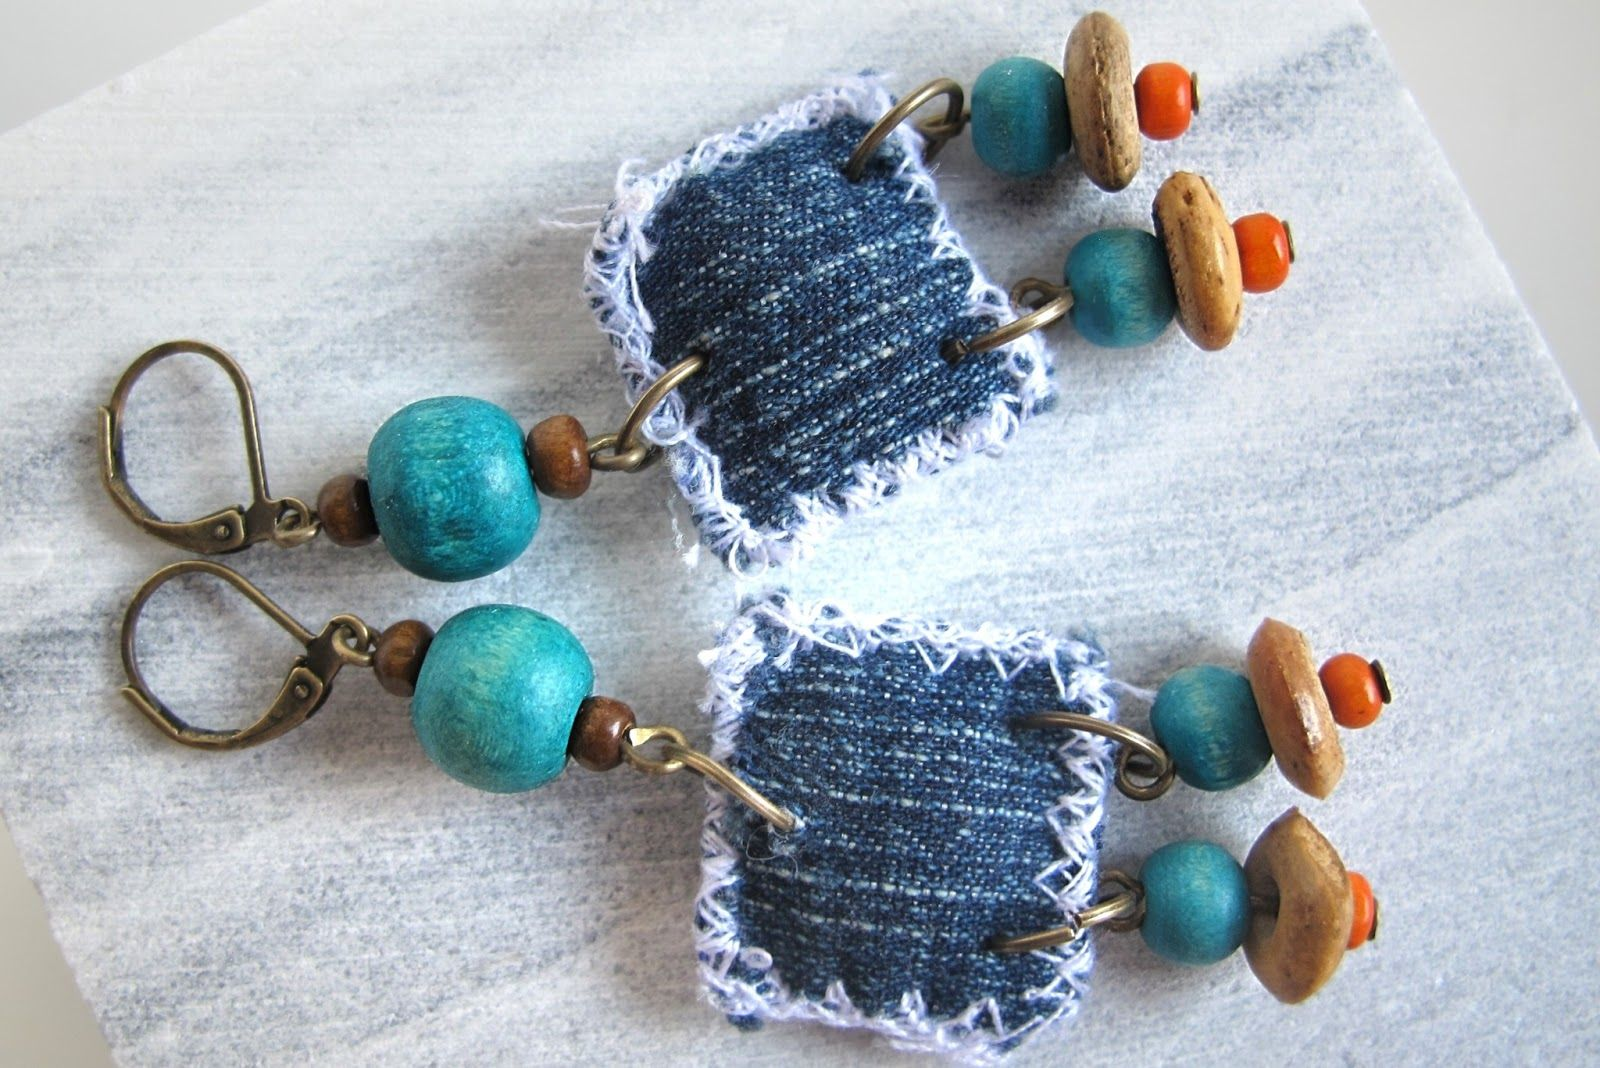 Moois van ' M(i)e': blue jeans aan de oren ...